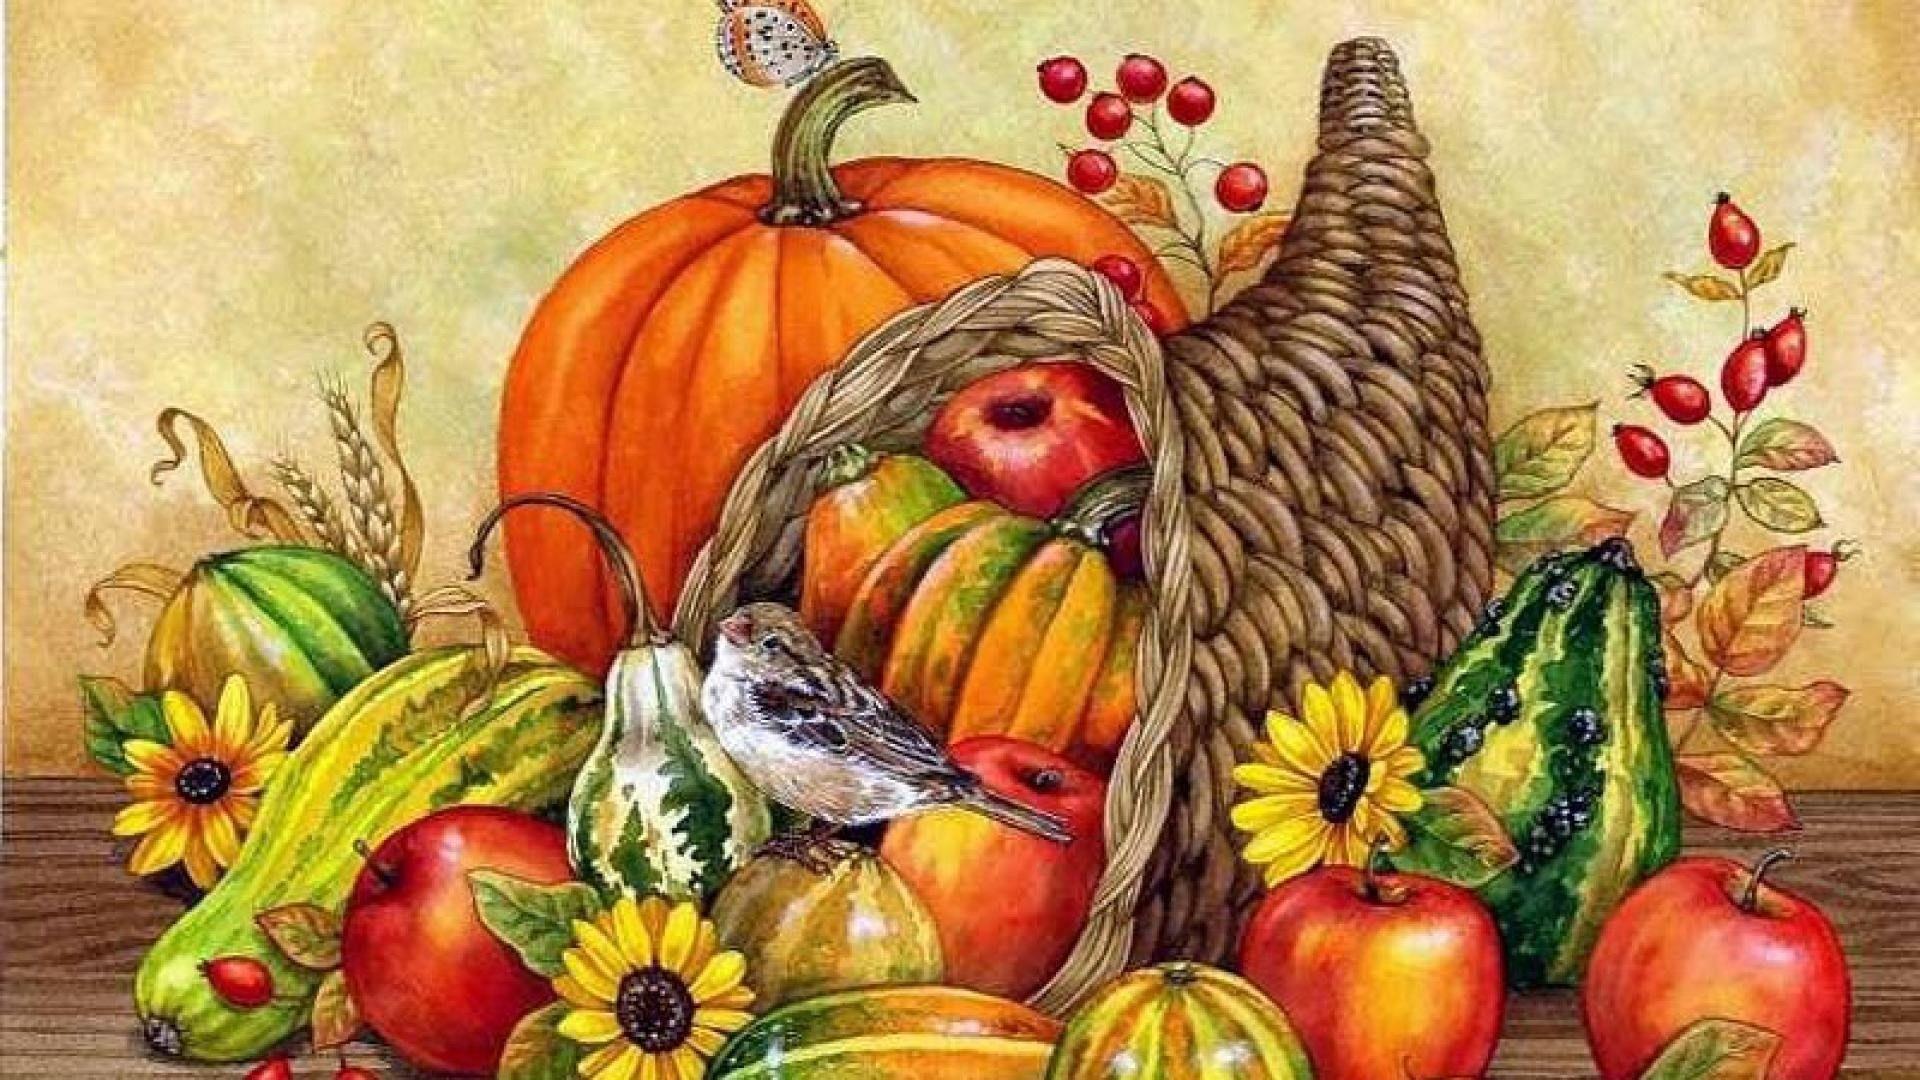 Thanksgiving Cornucopia Wallpapers - Wallpaper Cave